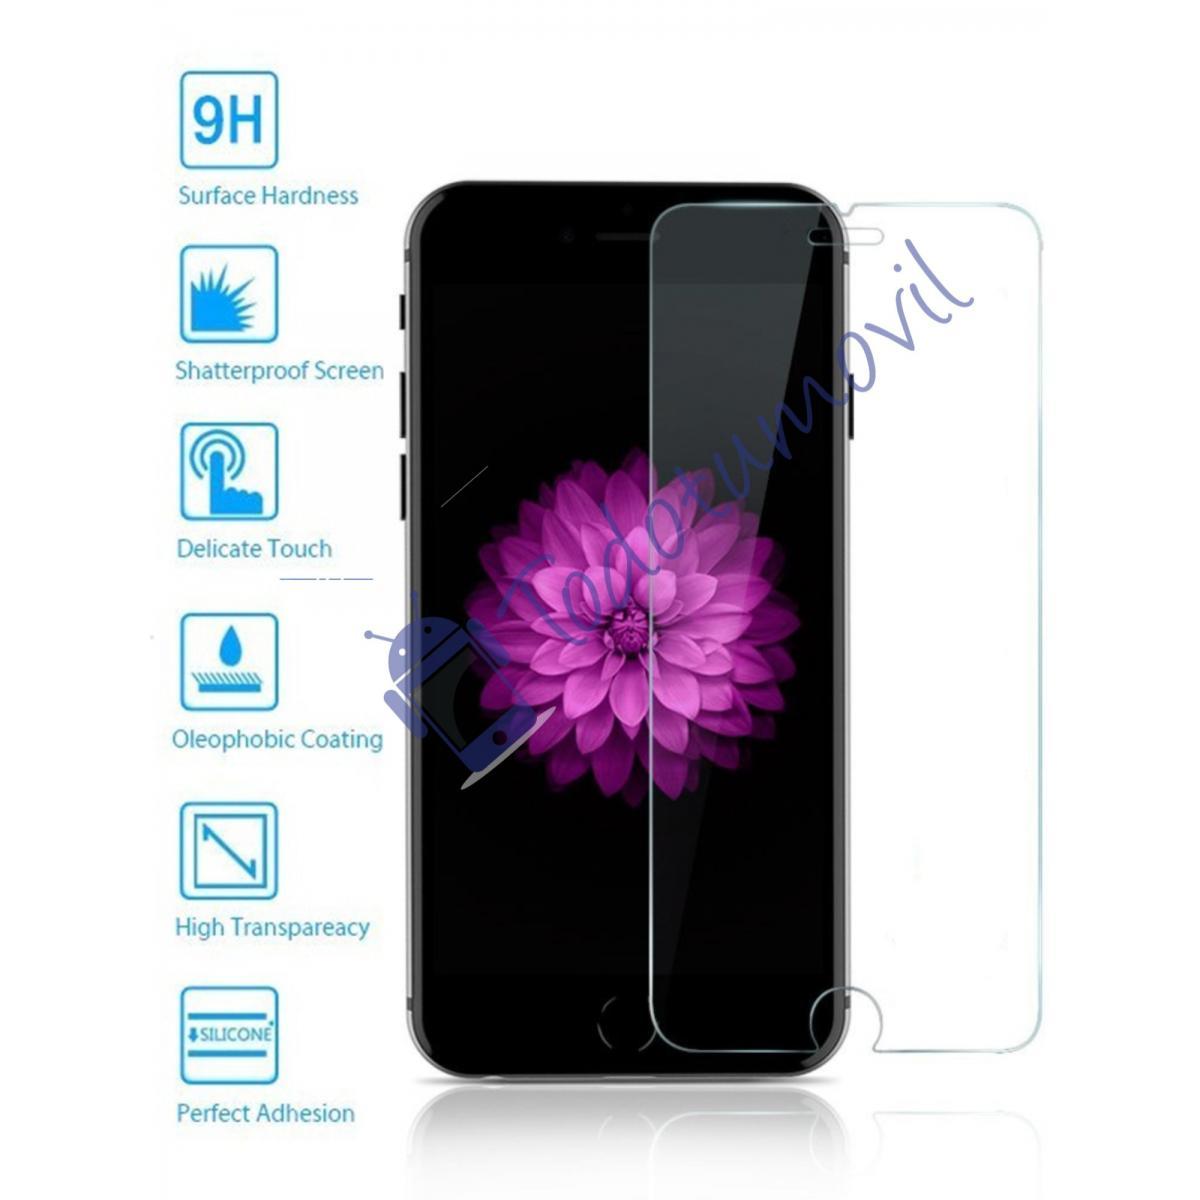 ee6a872fef4 En venta. Protector de Pantalla Cristal Templado Premium para Apple Iphone  6S, I6S 4,7